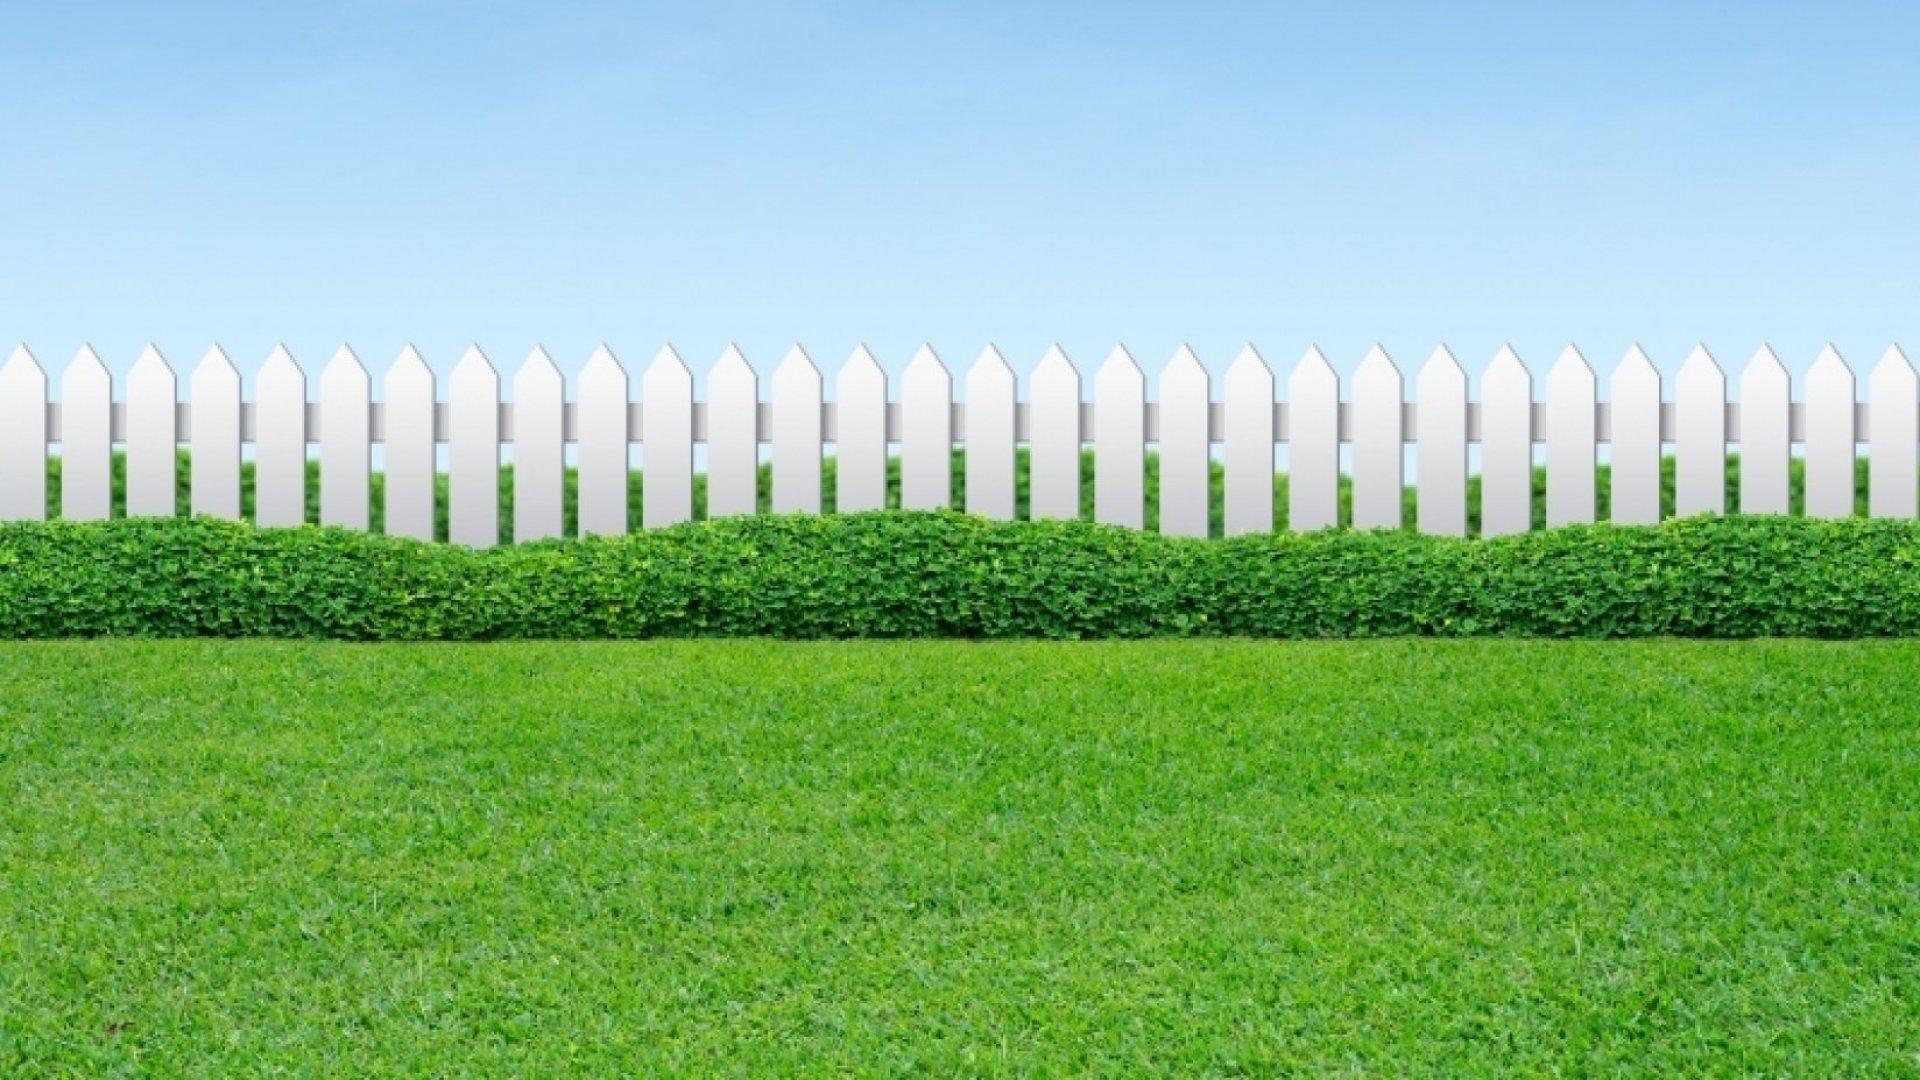 How LawnStarter Hit Double-Digit Growth Through Creative Marketing